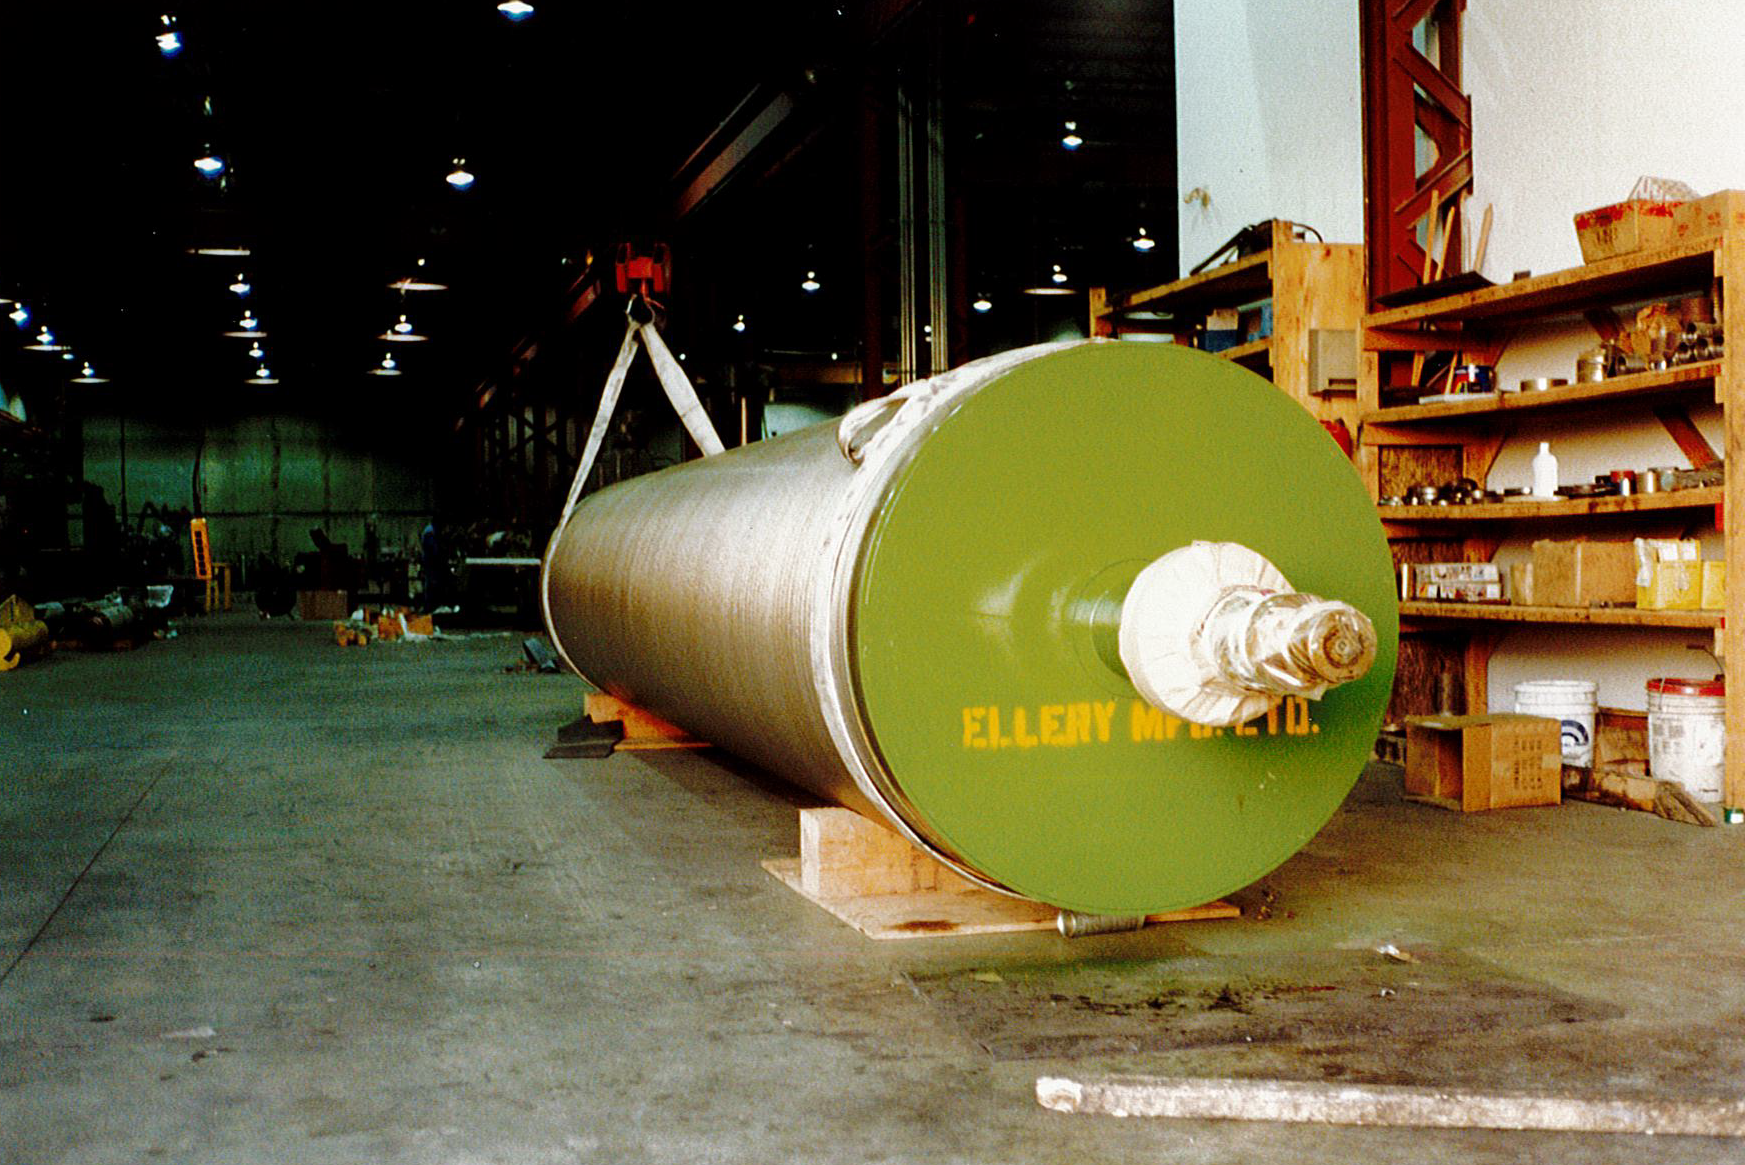 Ellery MFG Archive Image